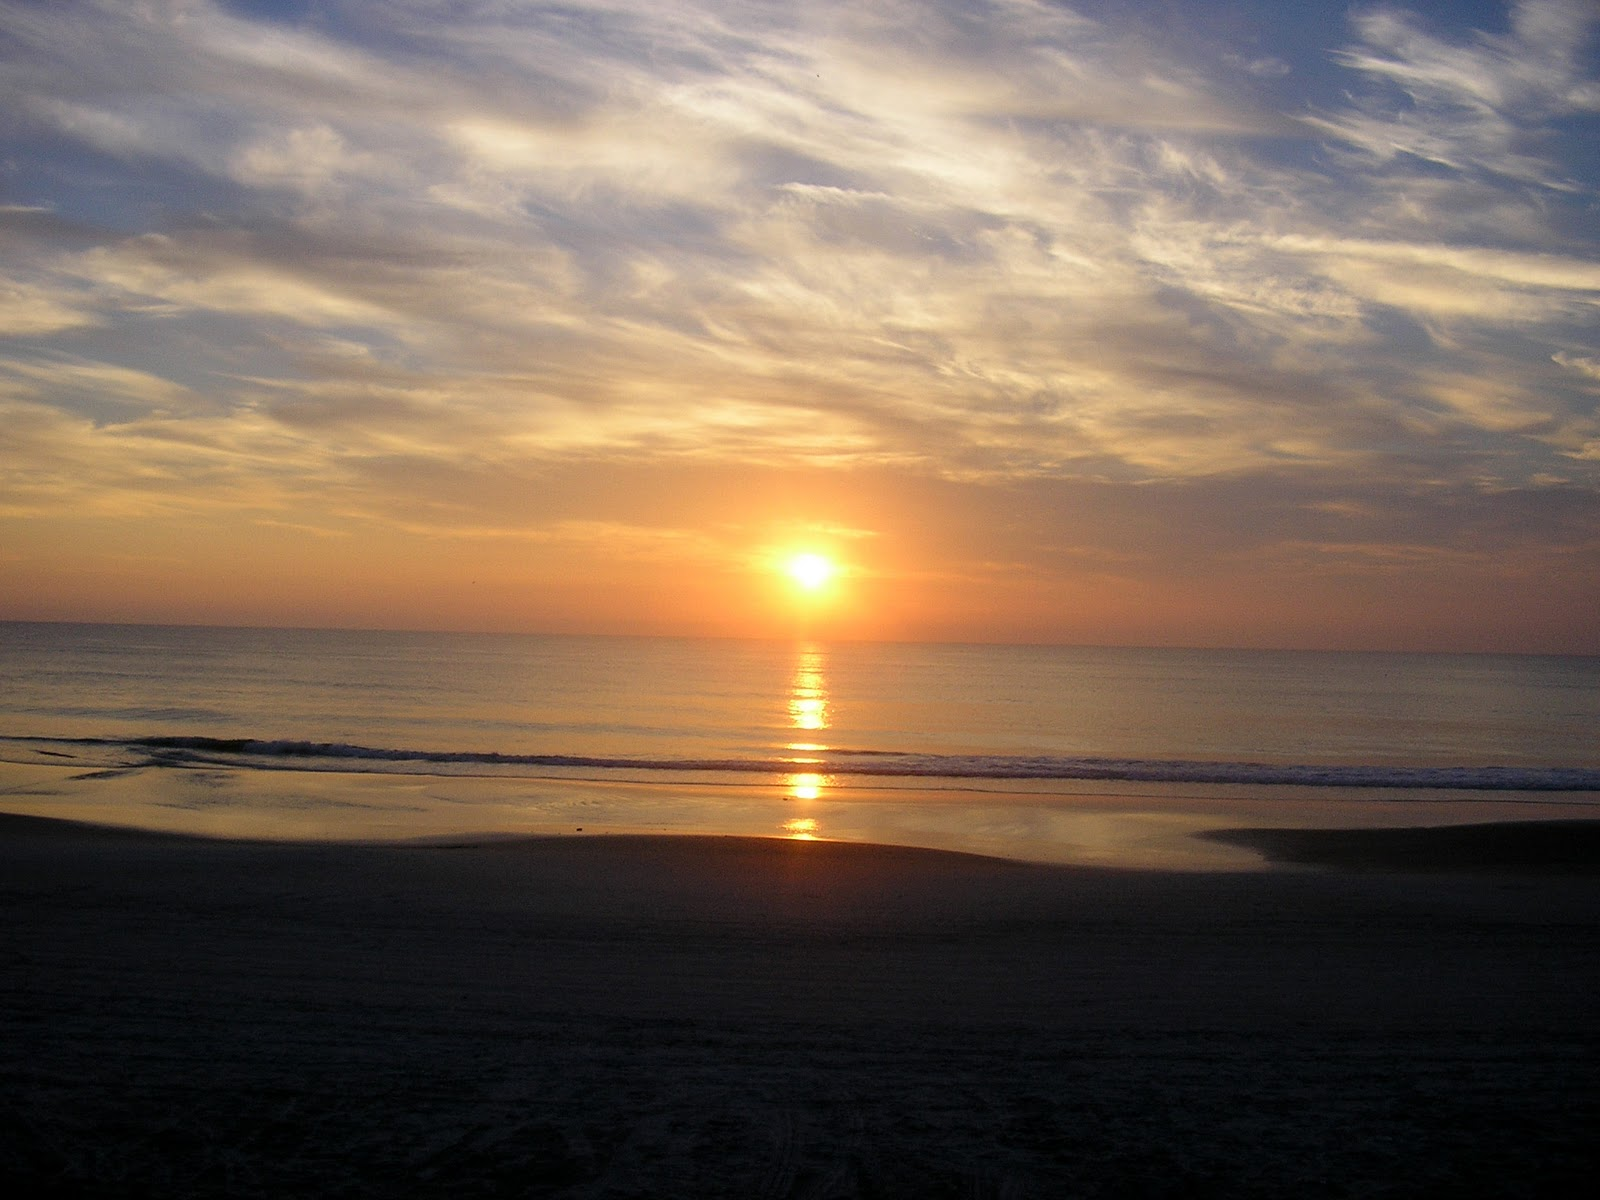 https://1.bp.blogspot.com/-Snbax7GpJgw/TVQkmZ_rwlI/AAAAAAAAF88/PBGqzwcXzD0/s1600/beach+wallpaper+%25288%2529.jpg